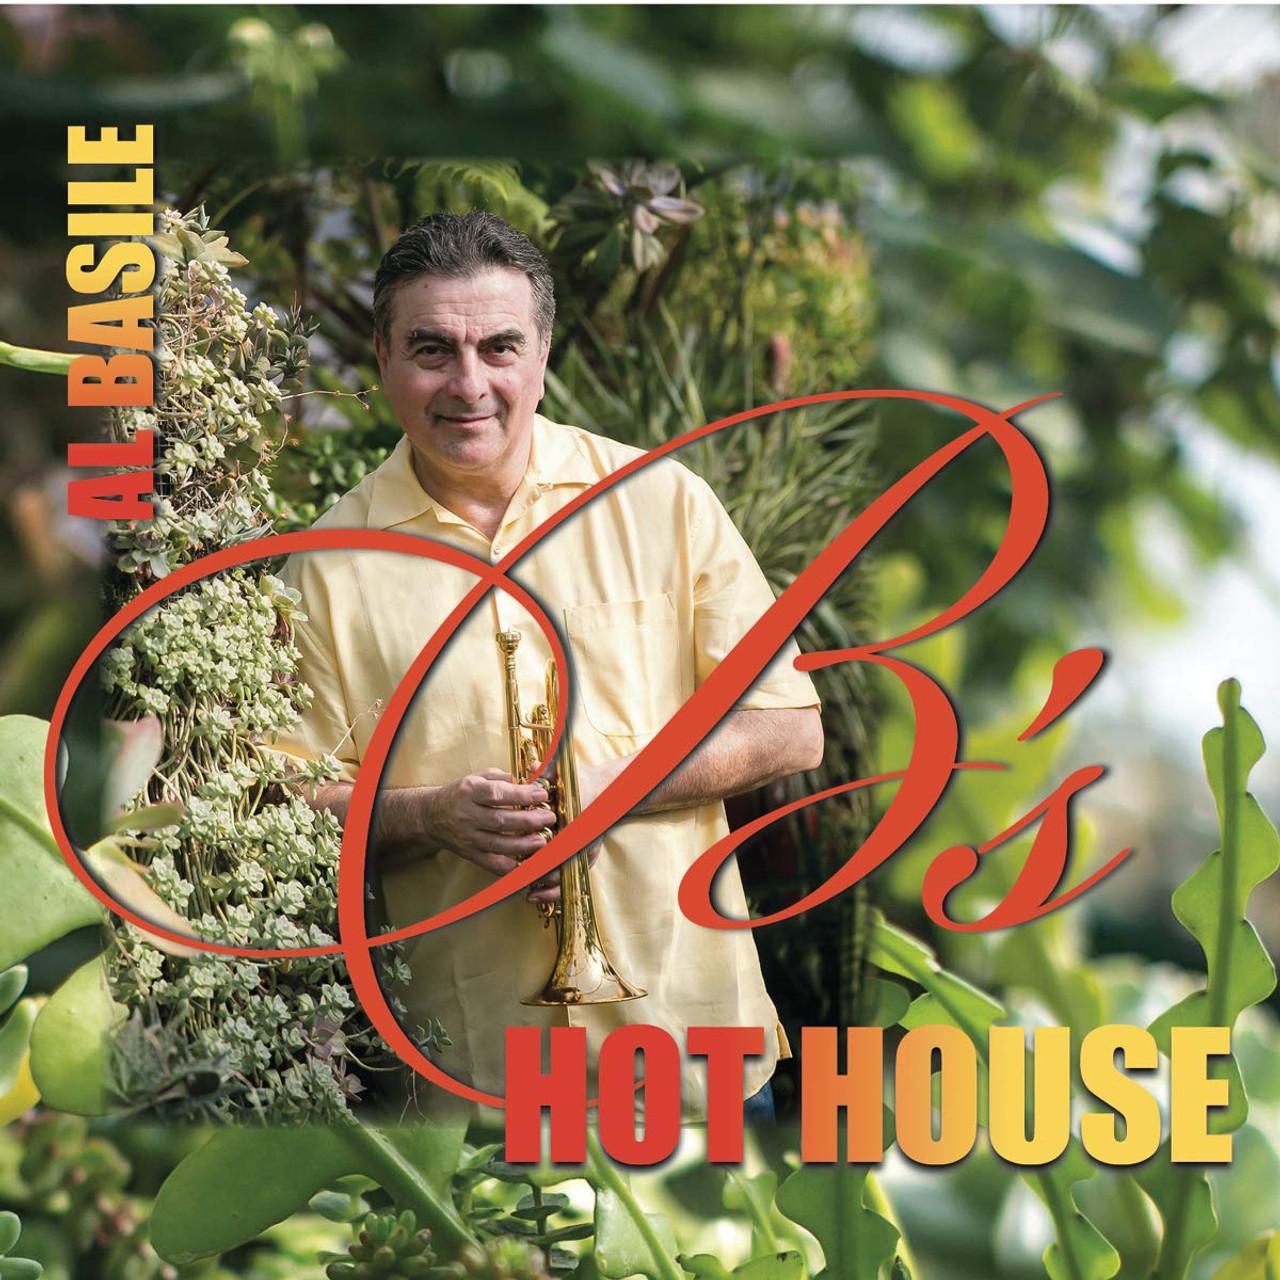 AL BASILE - B's Hothouse